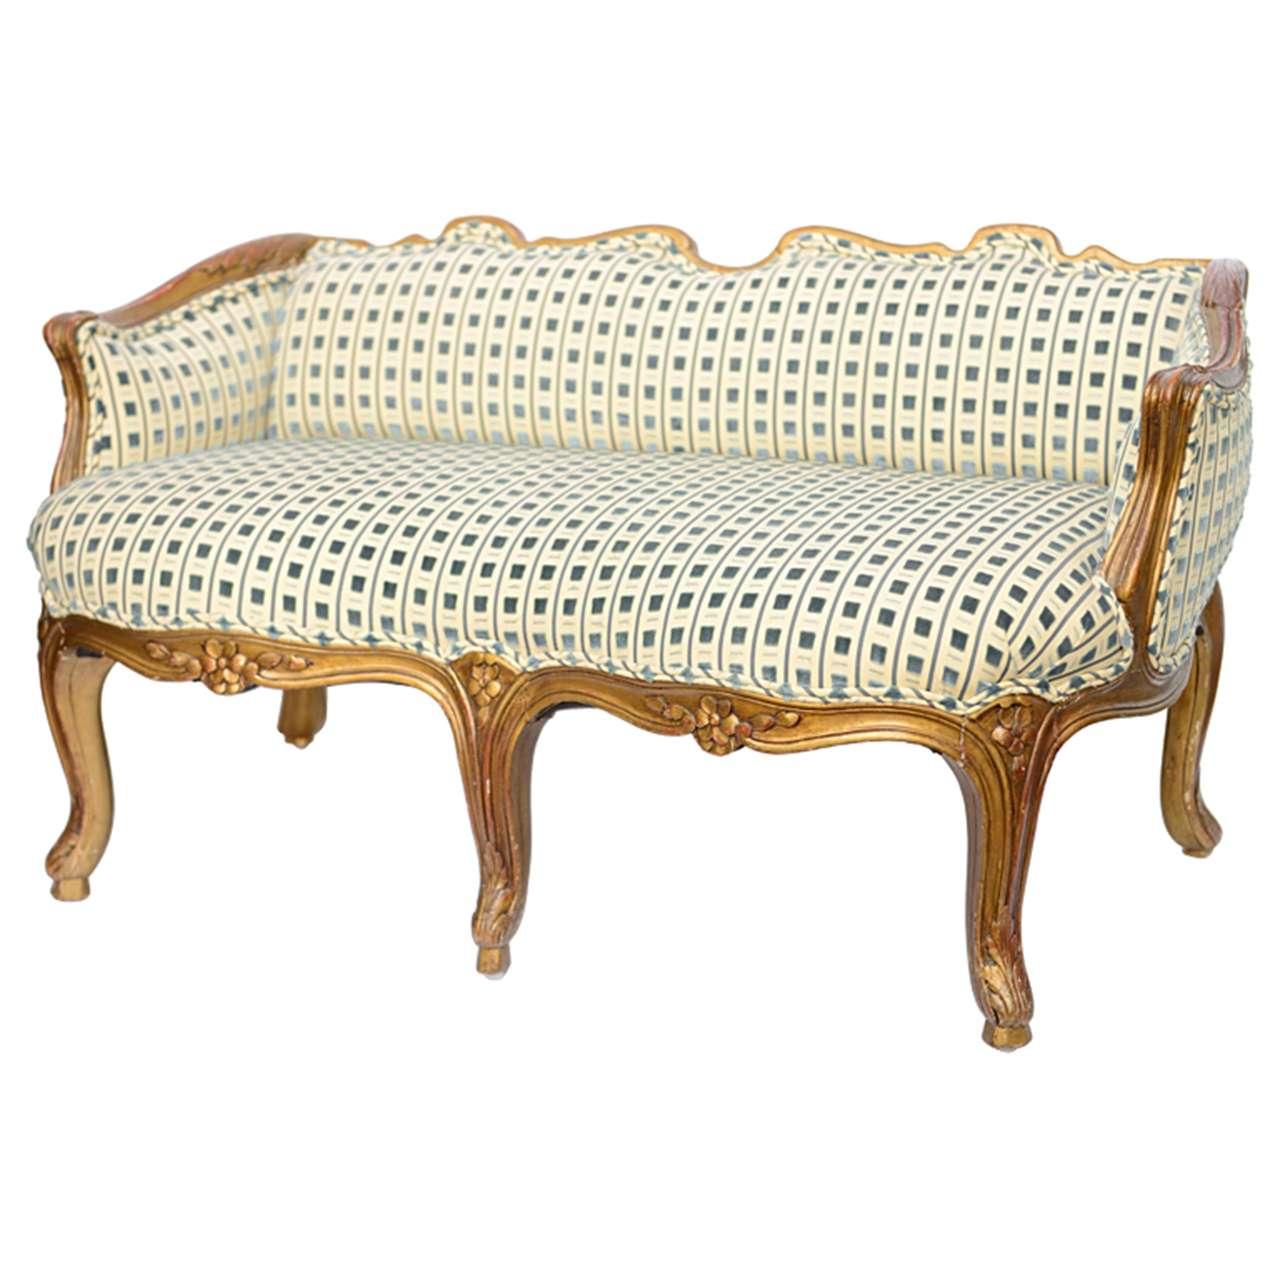 Late 19th Century Louis XV Style Miniature Sofa